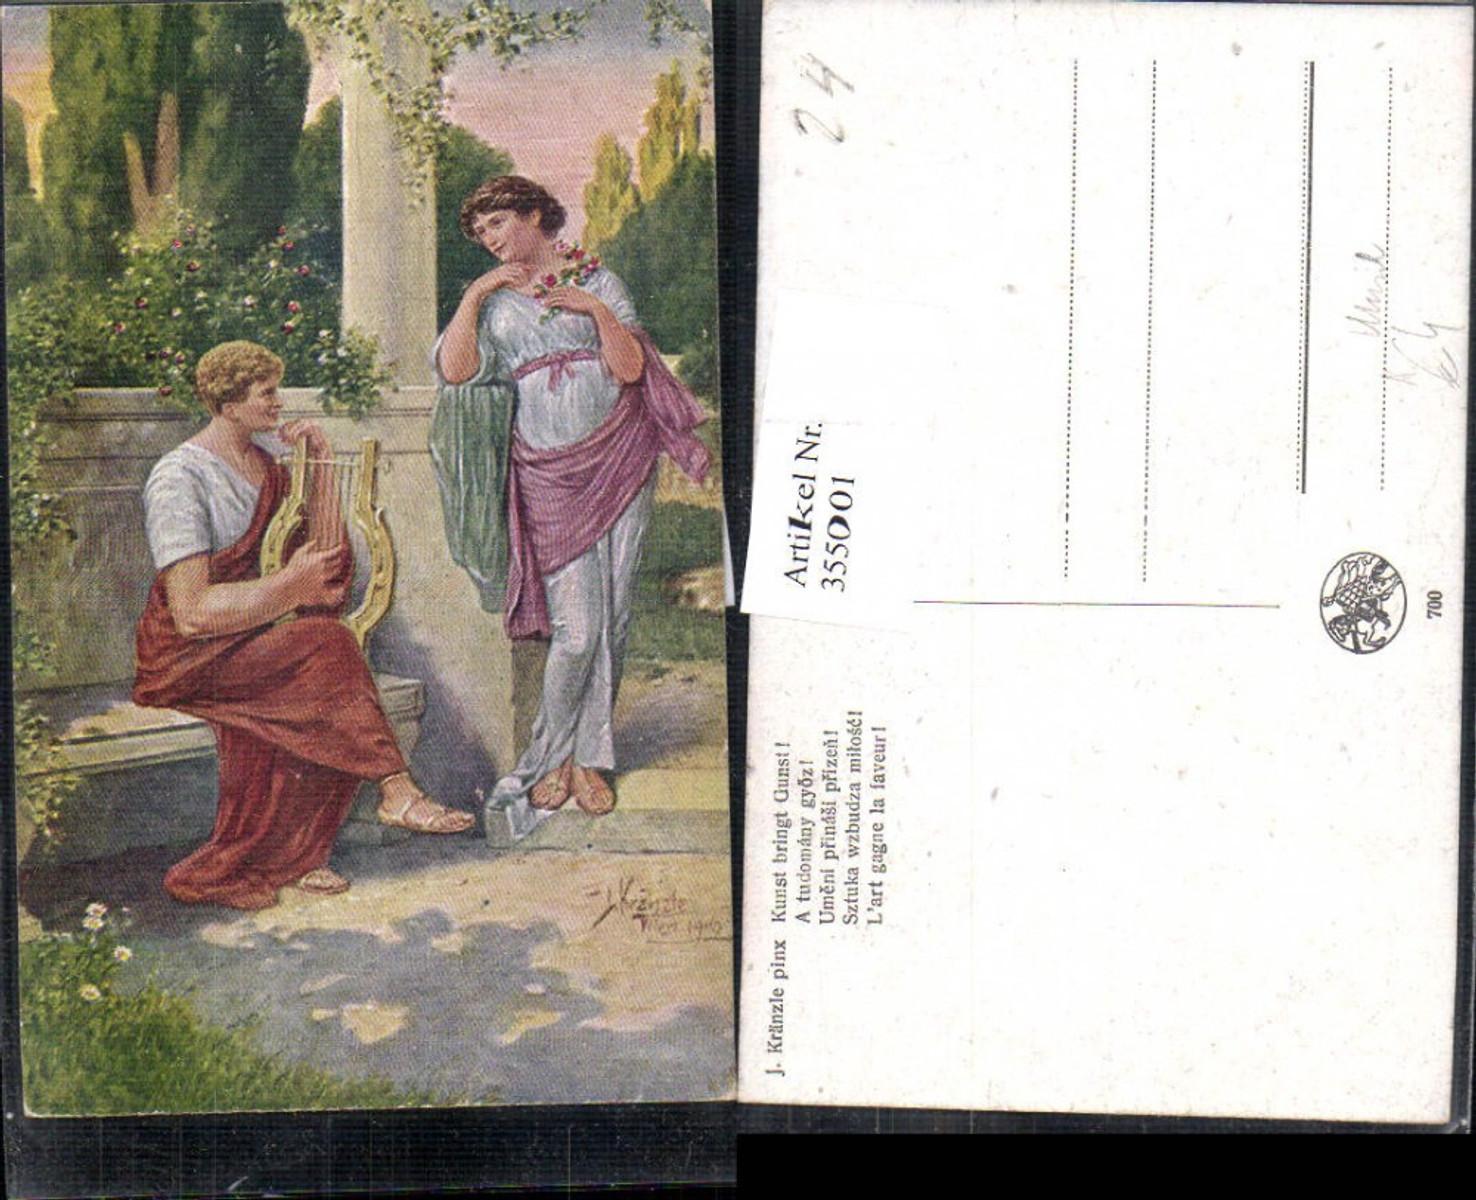 355001,Künstler Ak J. Kränzle Kunst bringt Gunst Mann Handharfe Frau hört zu Musik  günstig online kaufen